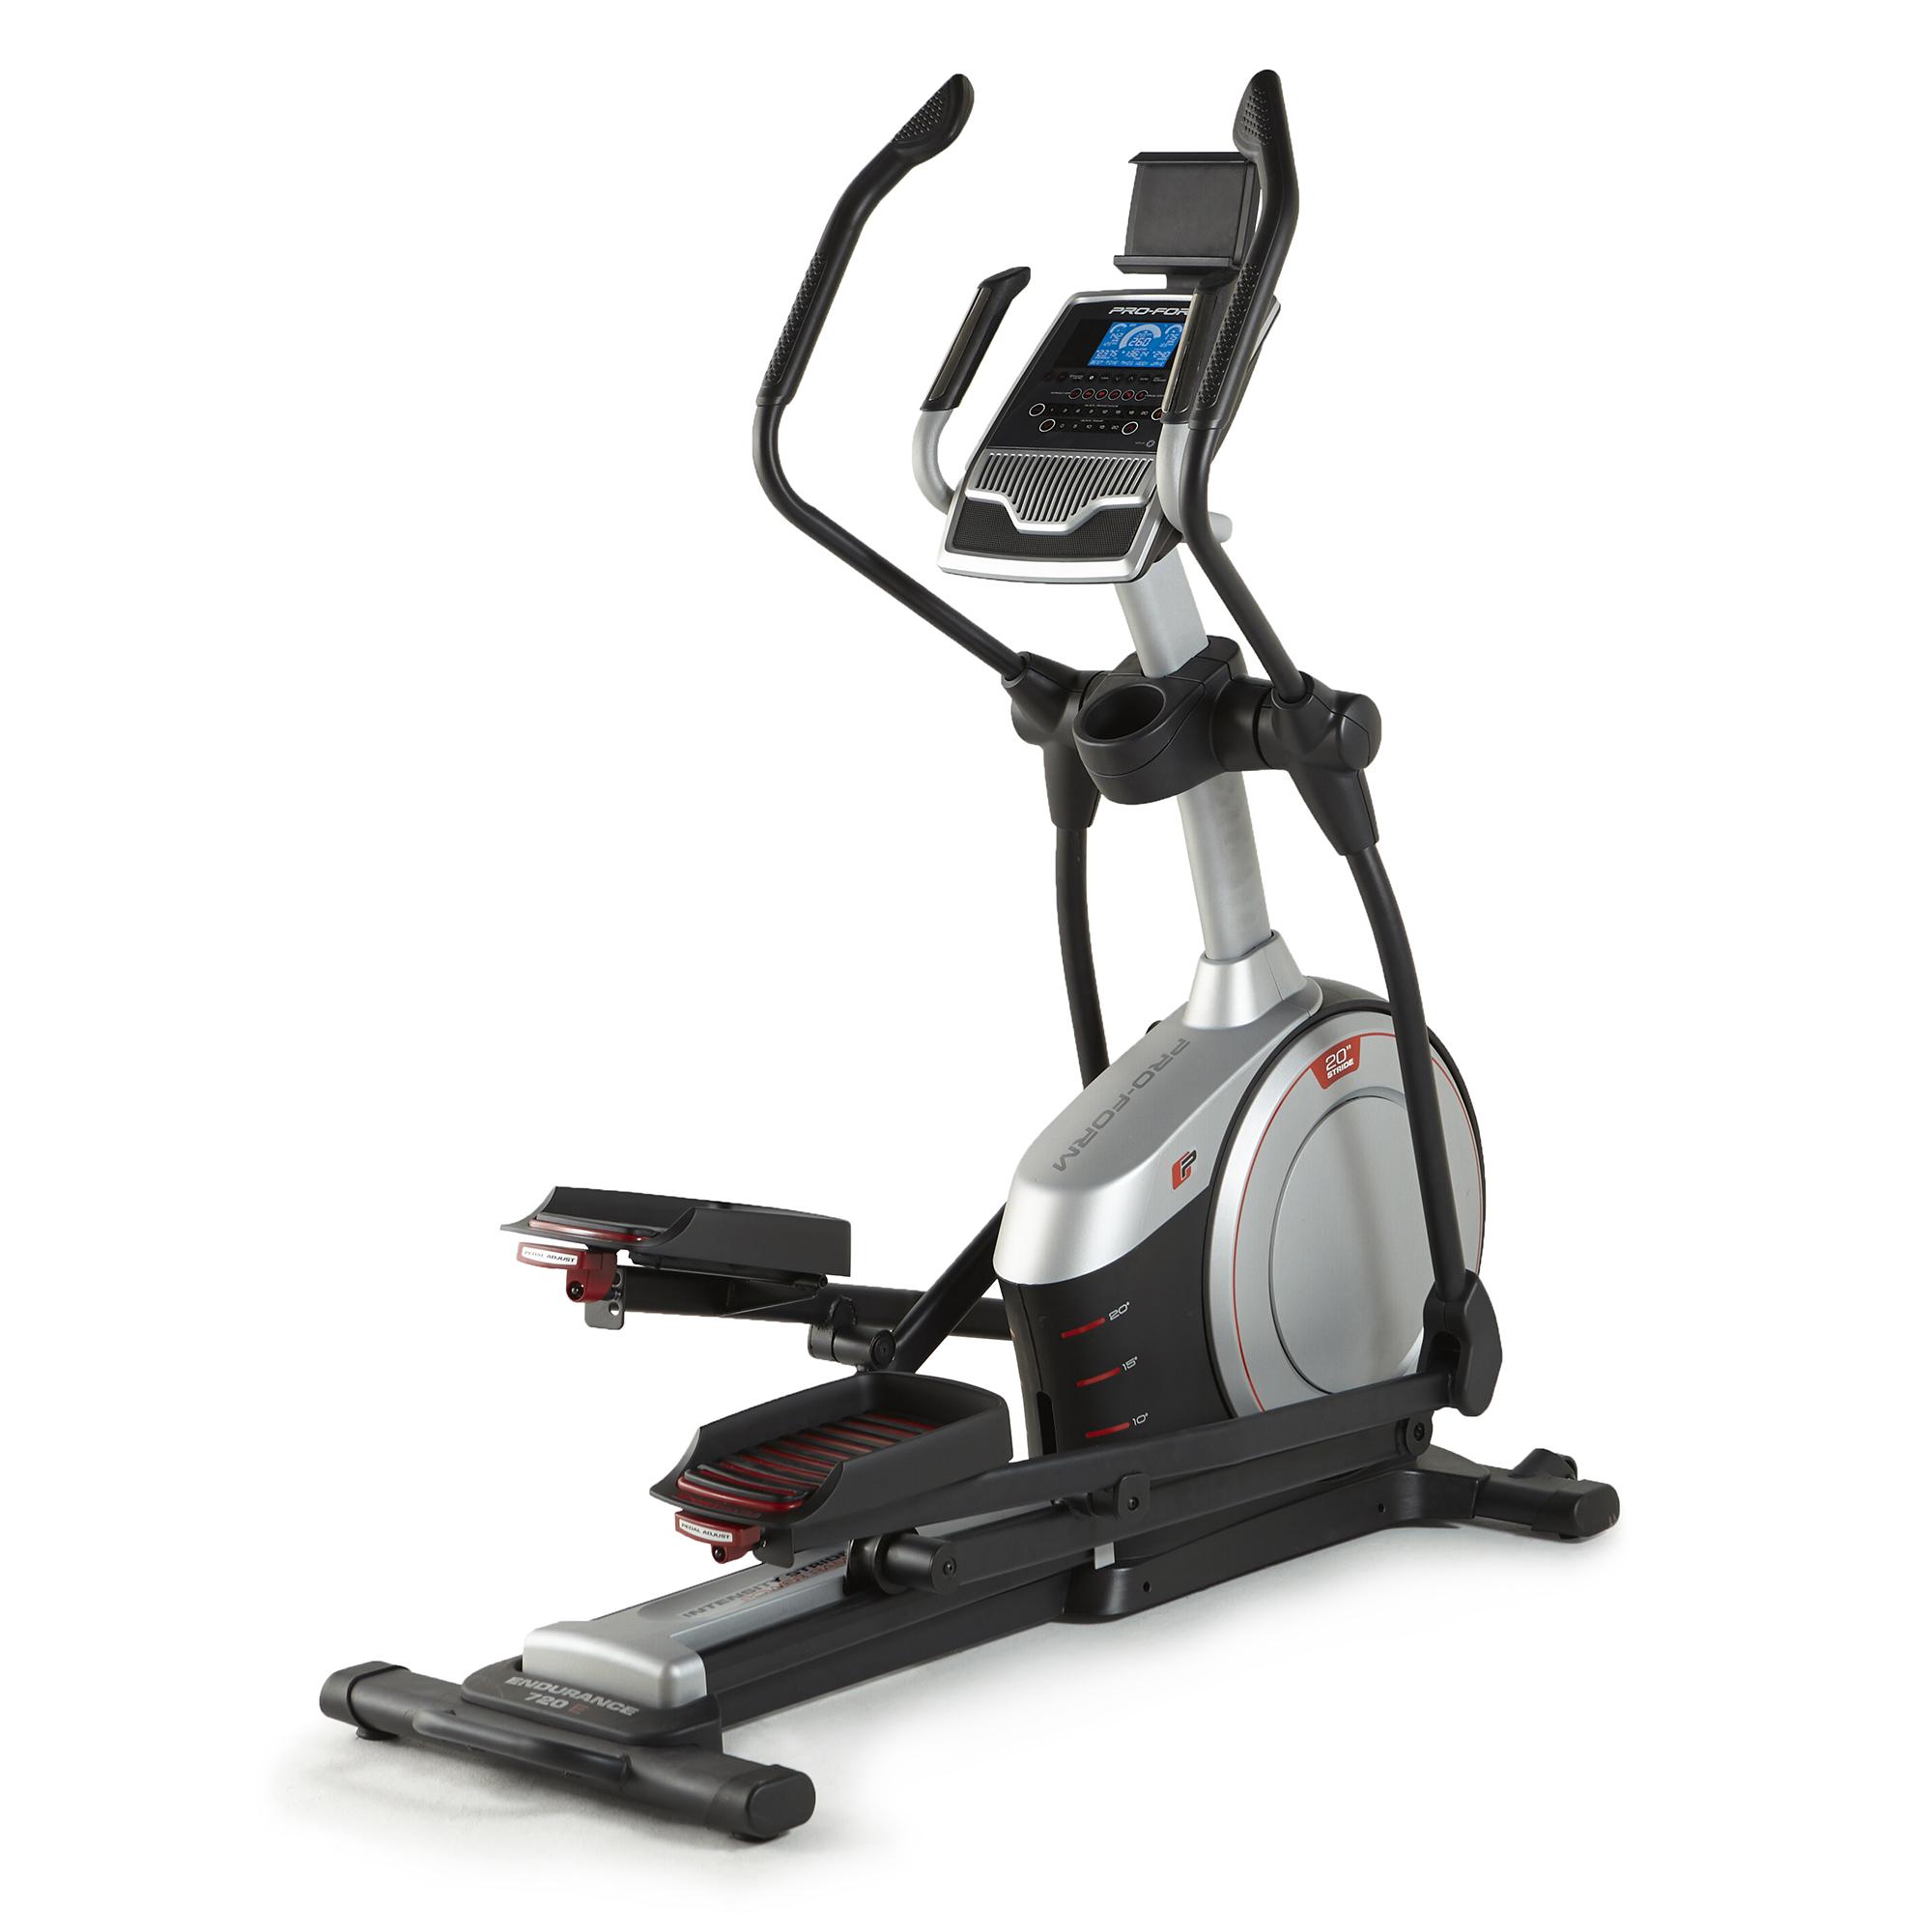 mat mats endurance proform cyclery elliptical indoor products